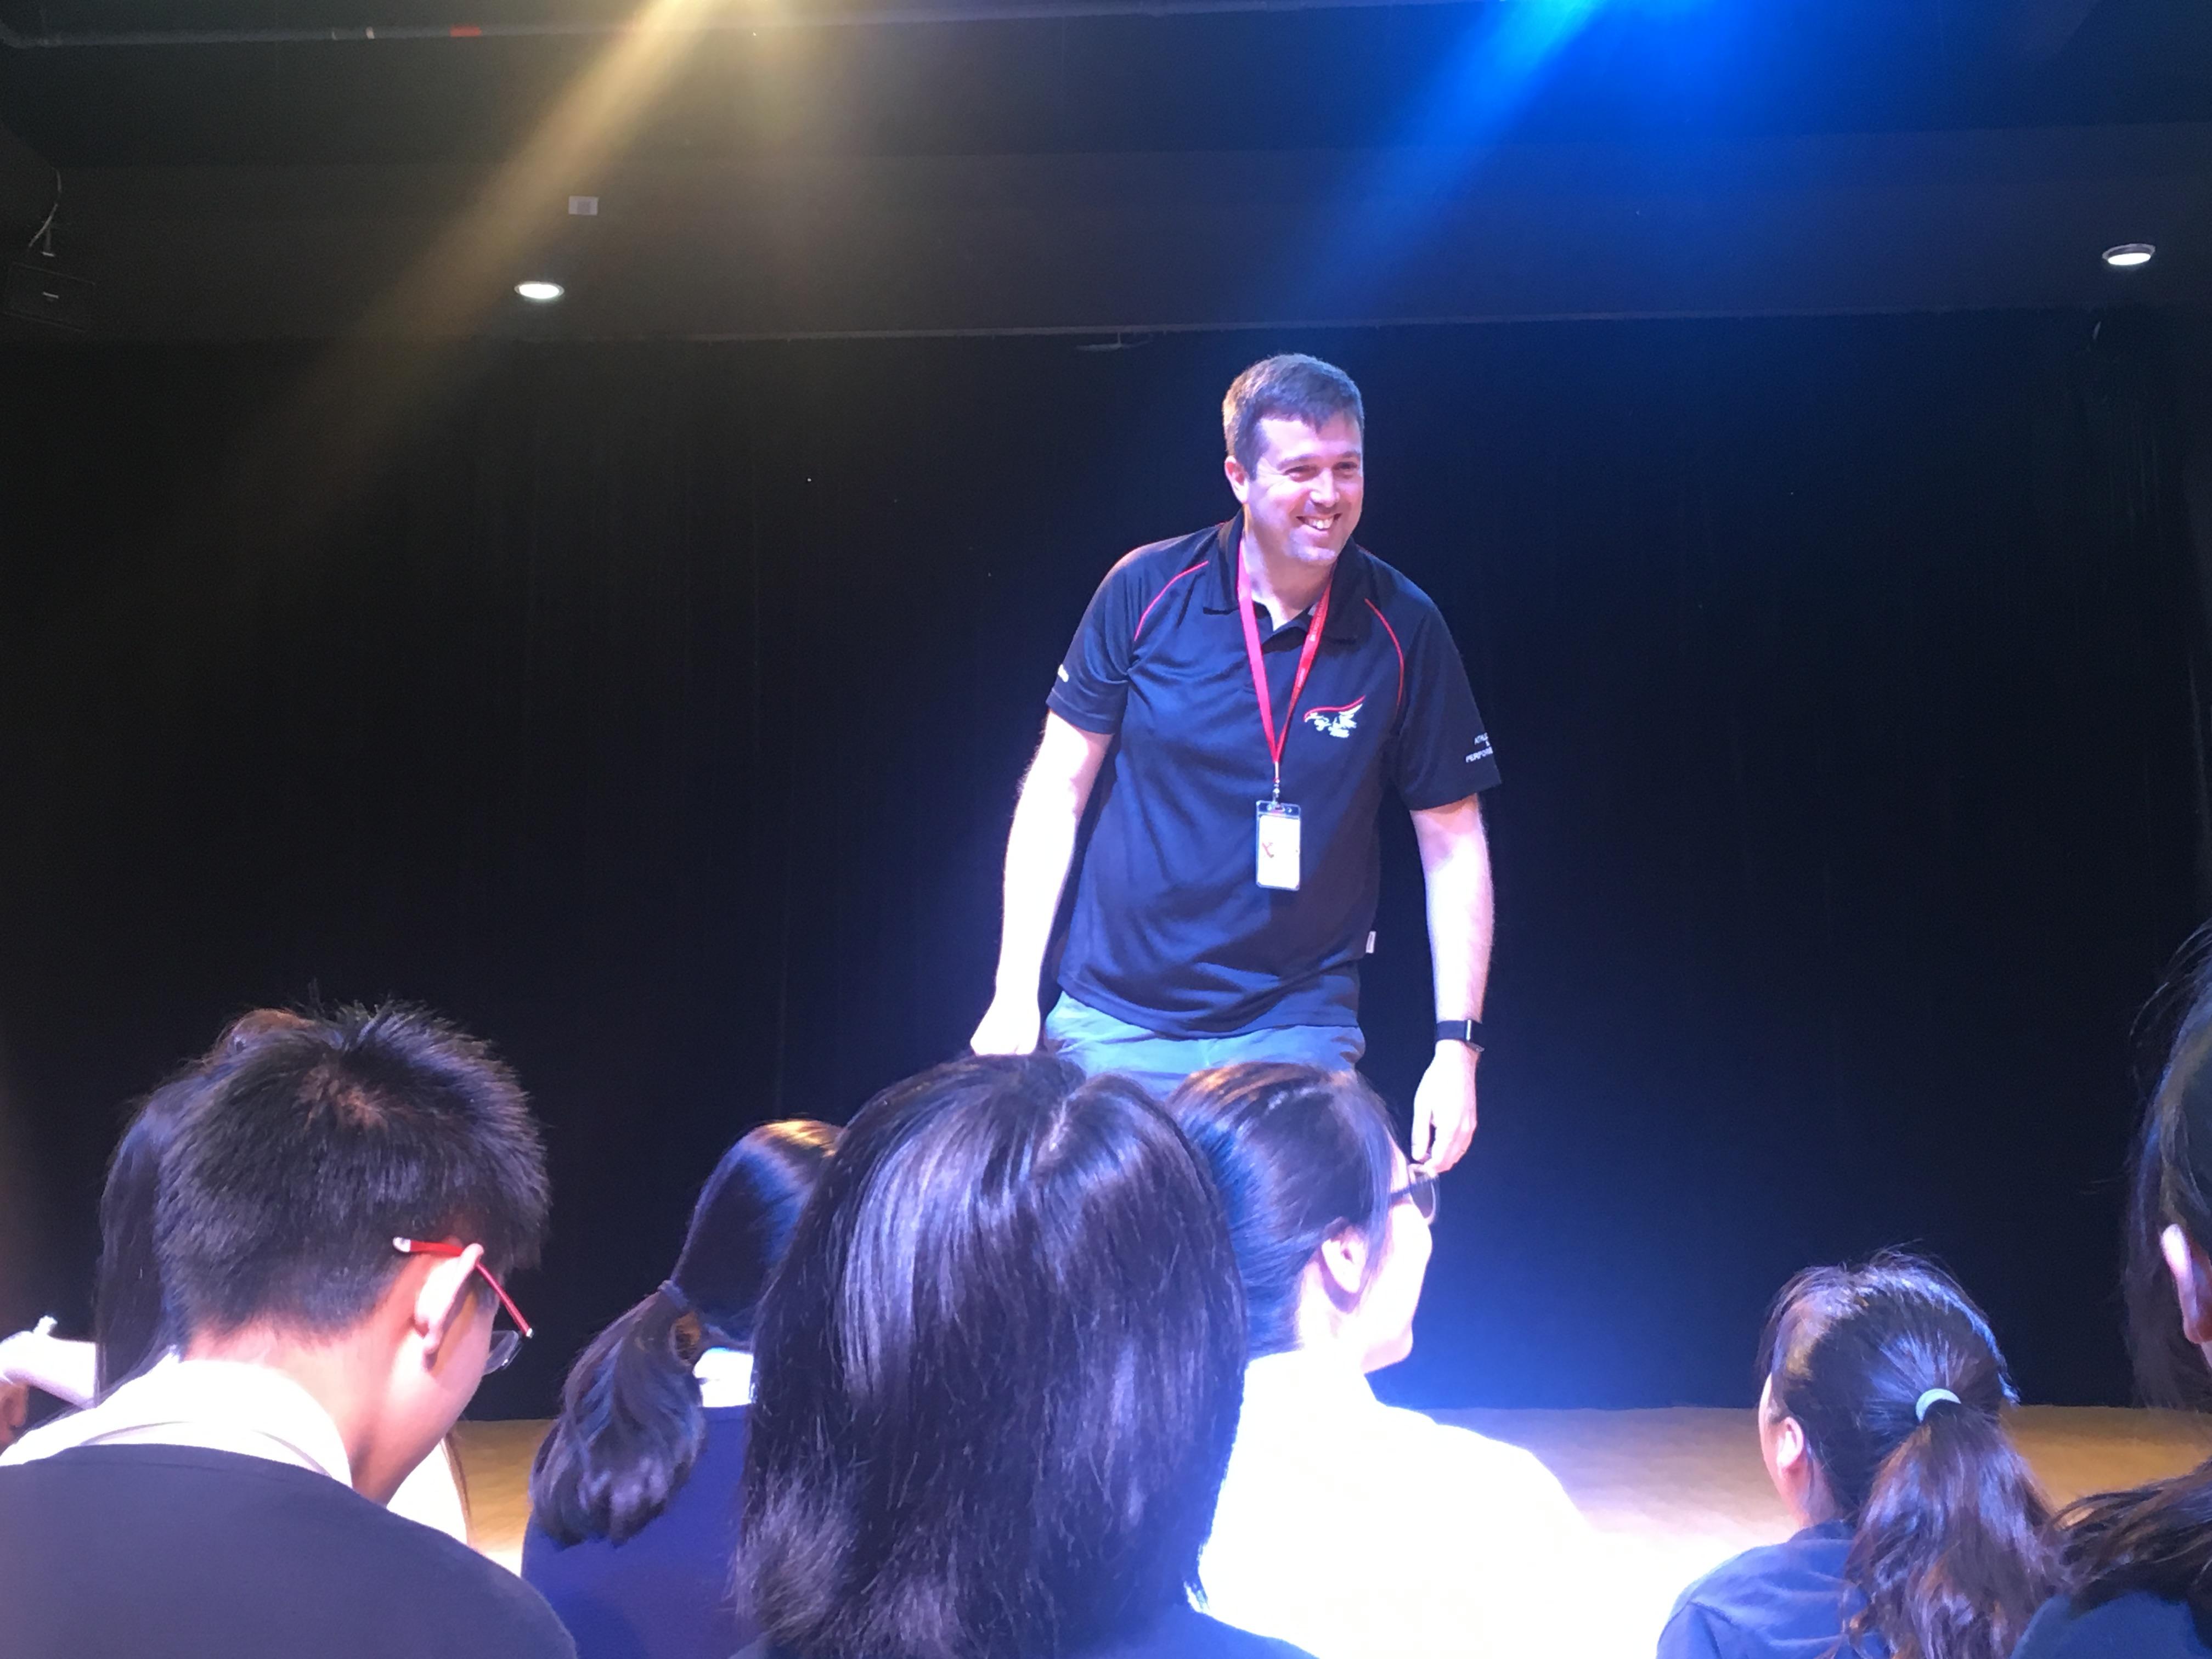 Drama and theatre teacher Kieran Burgess DCB